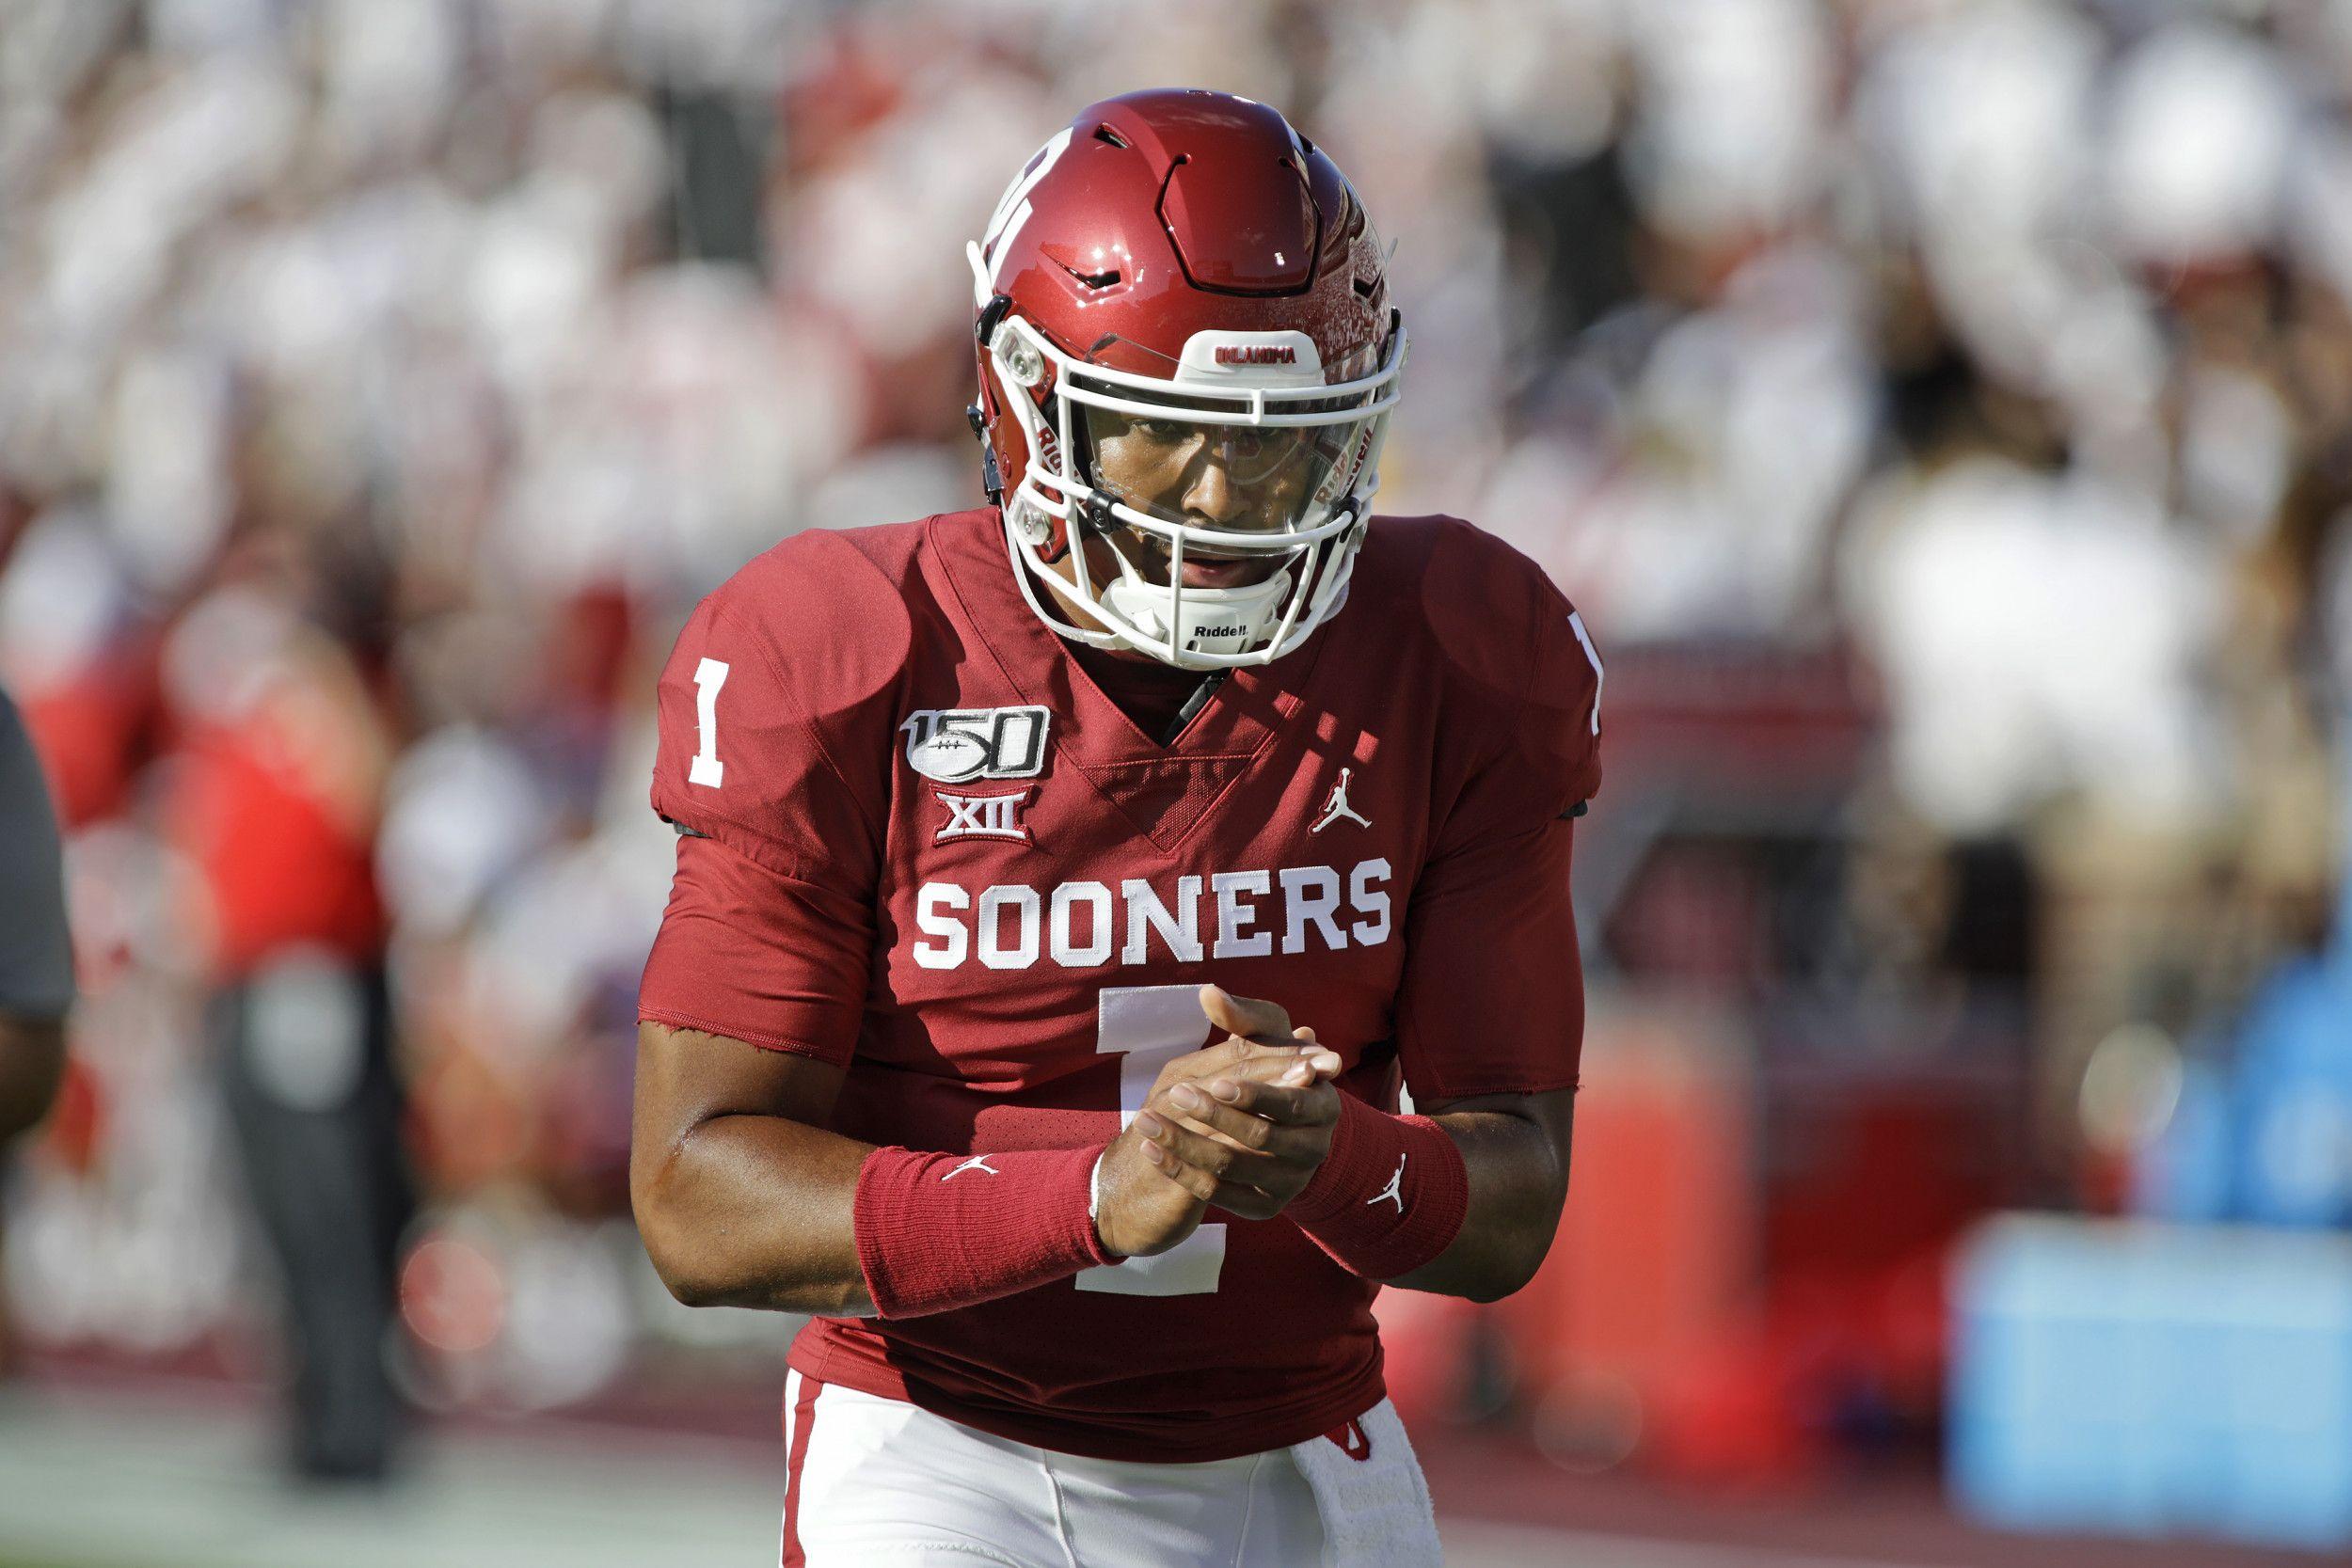 College Football 2019: Where to watch South Dakota vs ...